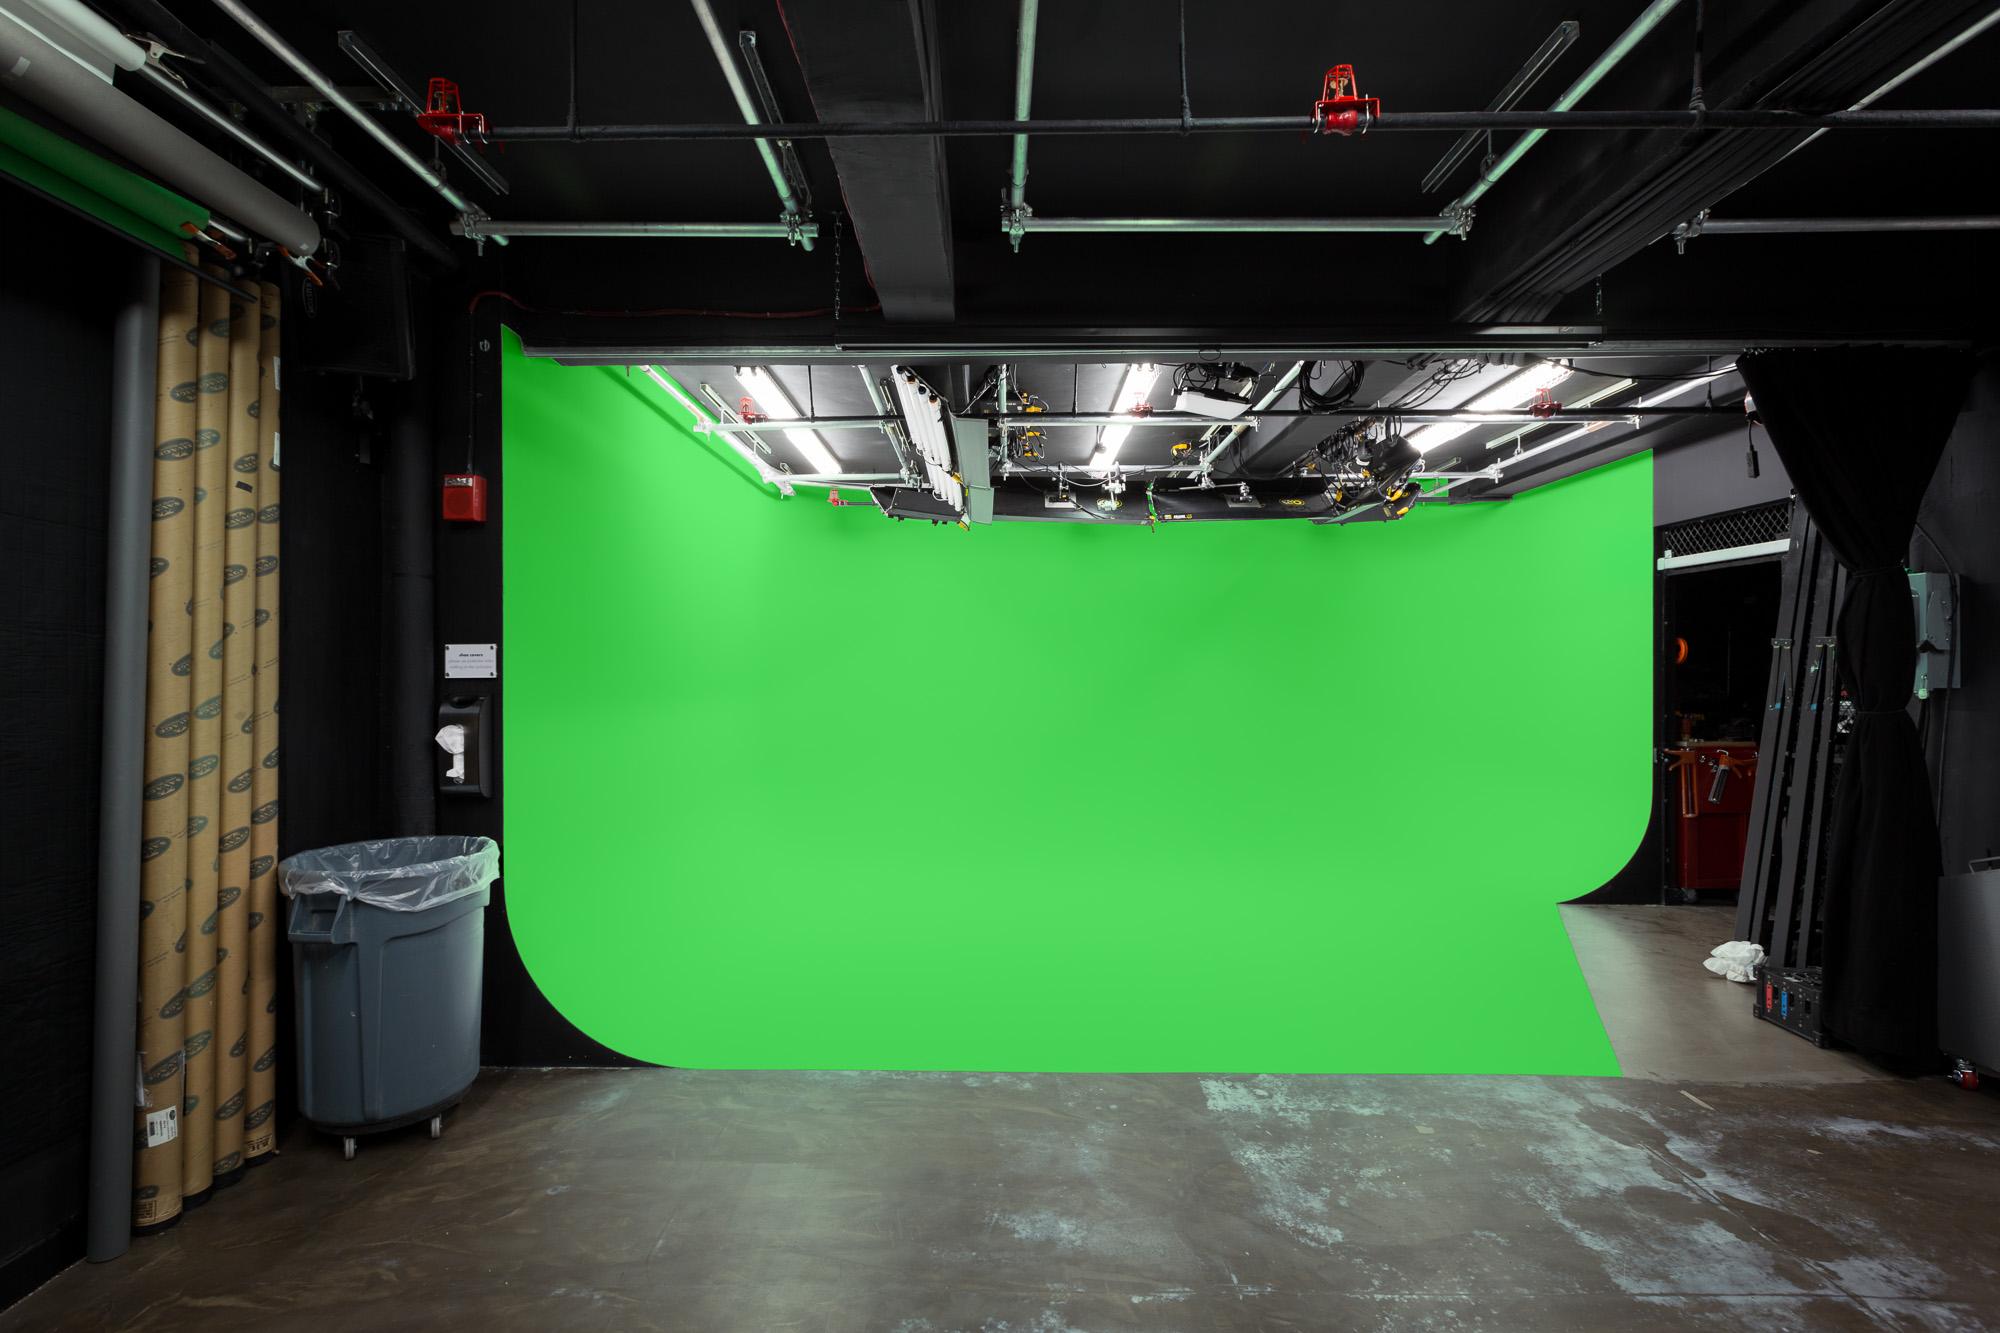 deverge_studio-20170421a-0001b-med.jpg